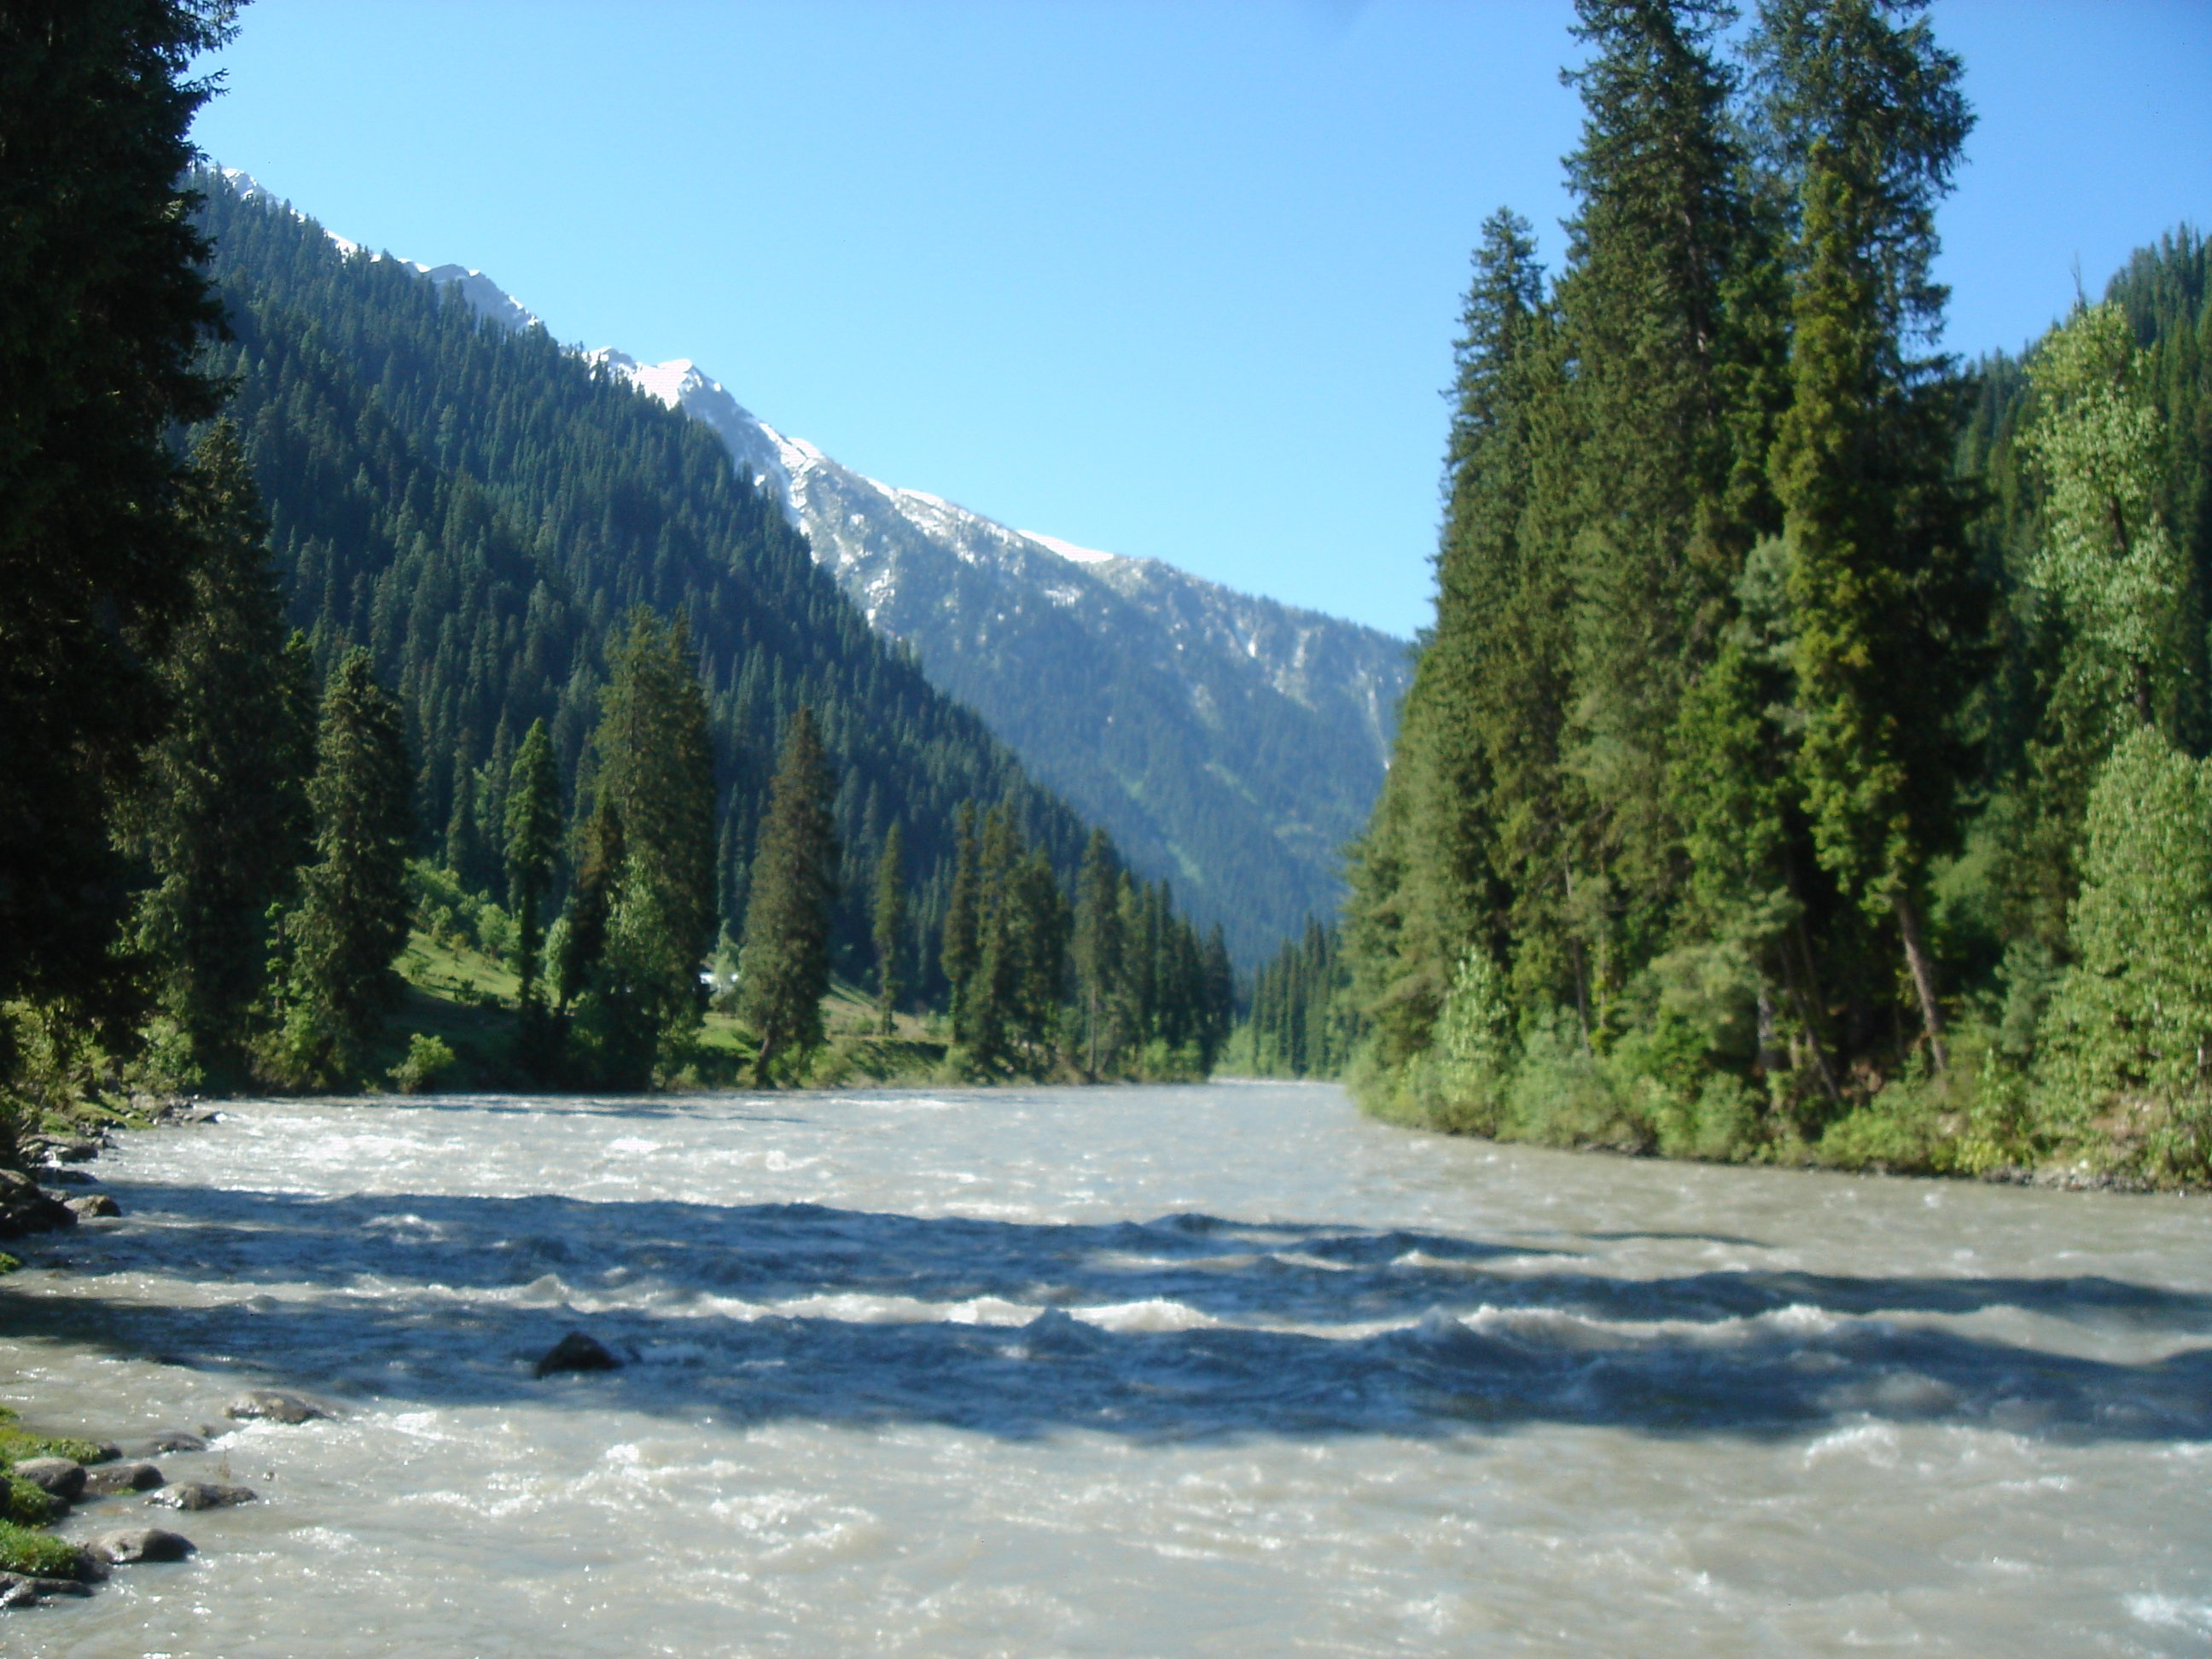 neelum river hd free - photo #7